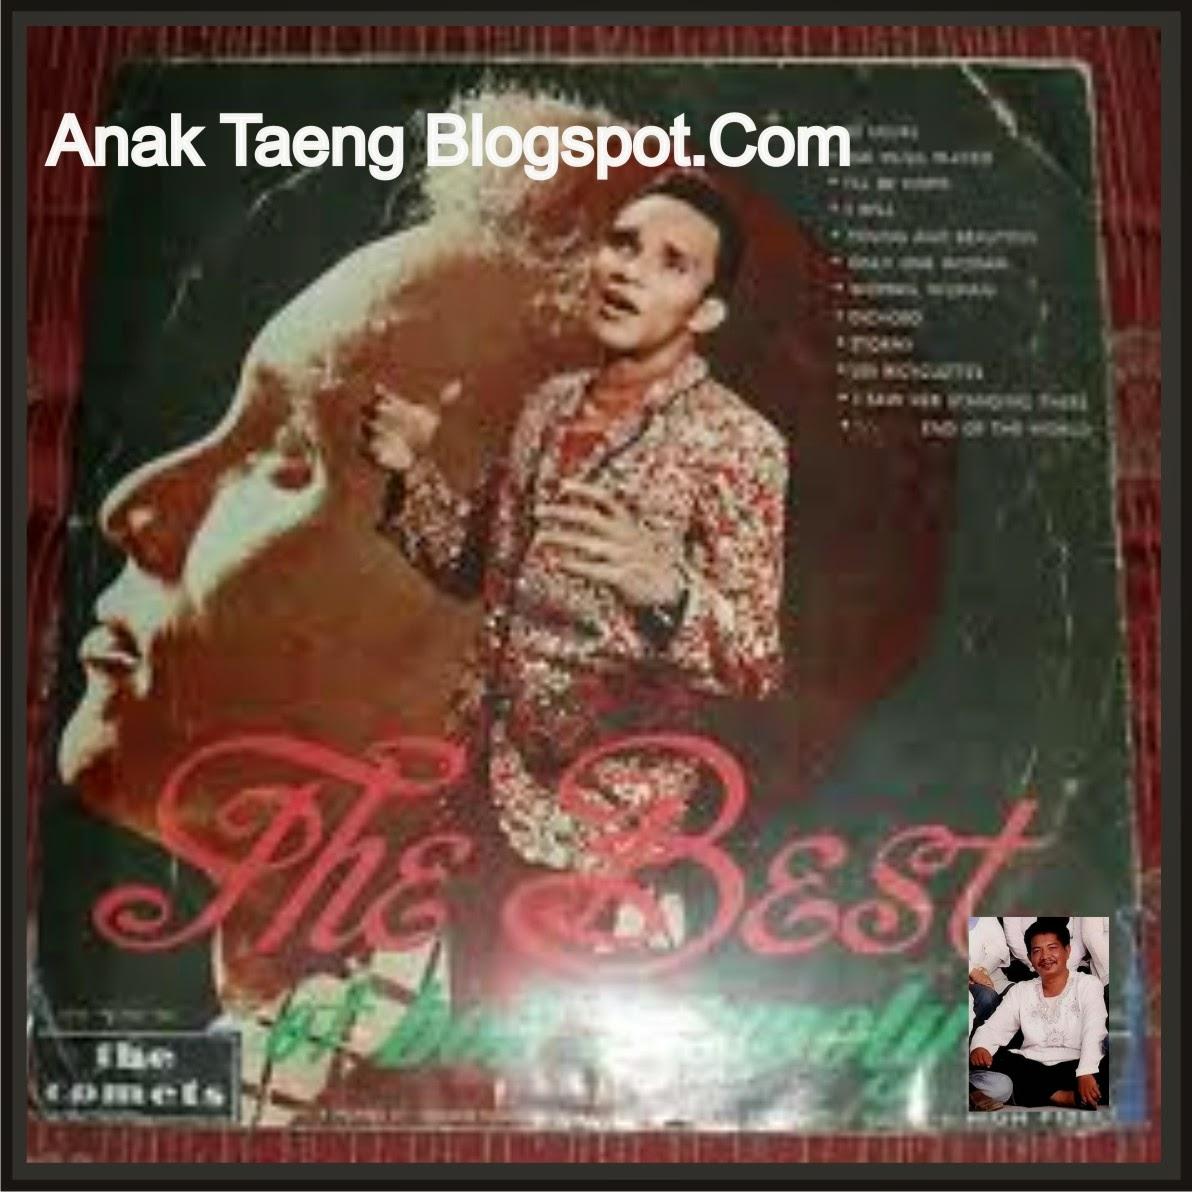 Dwonloand Lagu Meraih Bintang: Download Lagu Untuk Dikenang (by Anak Taeng): Bob Tutupoly